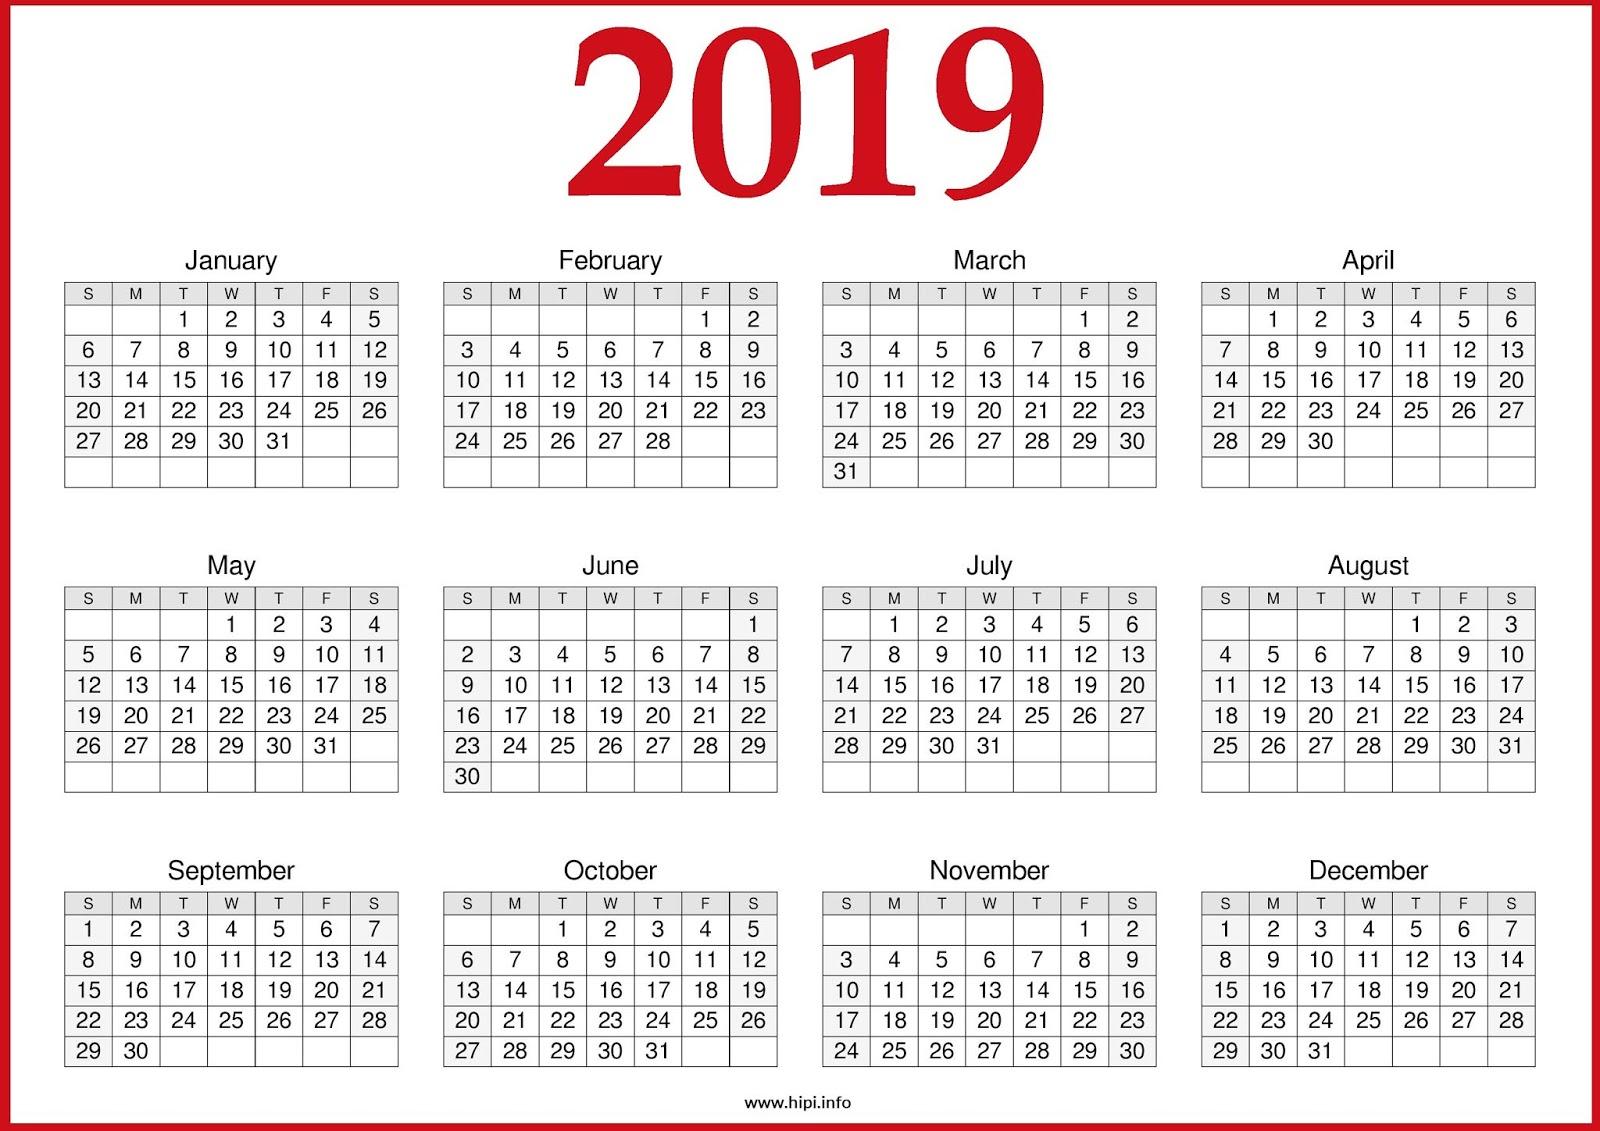 Yearly Calendar Template 2019 - Free Printable Calendar, Templates